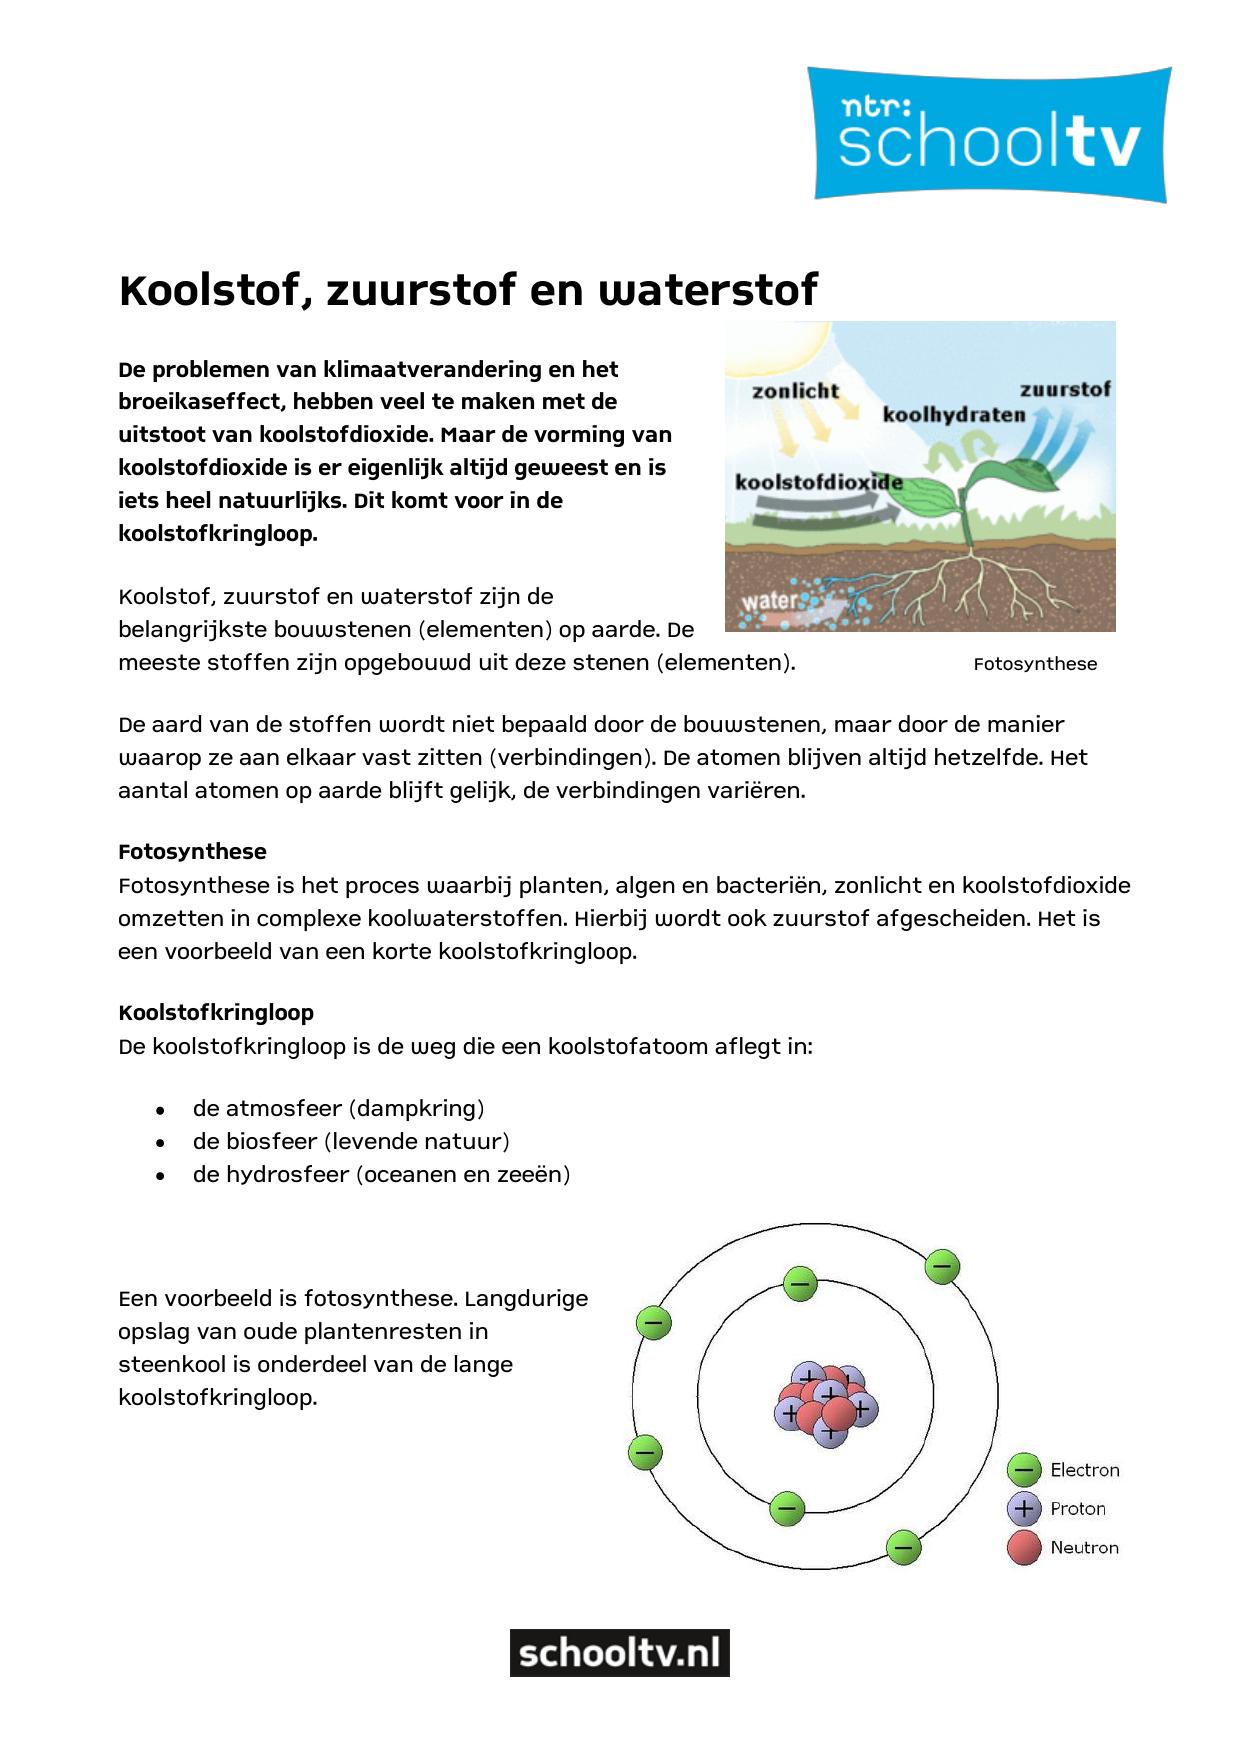 Koolstof Zuurstof En Waterstof